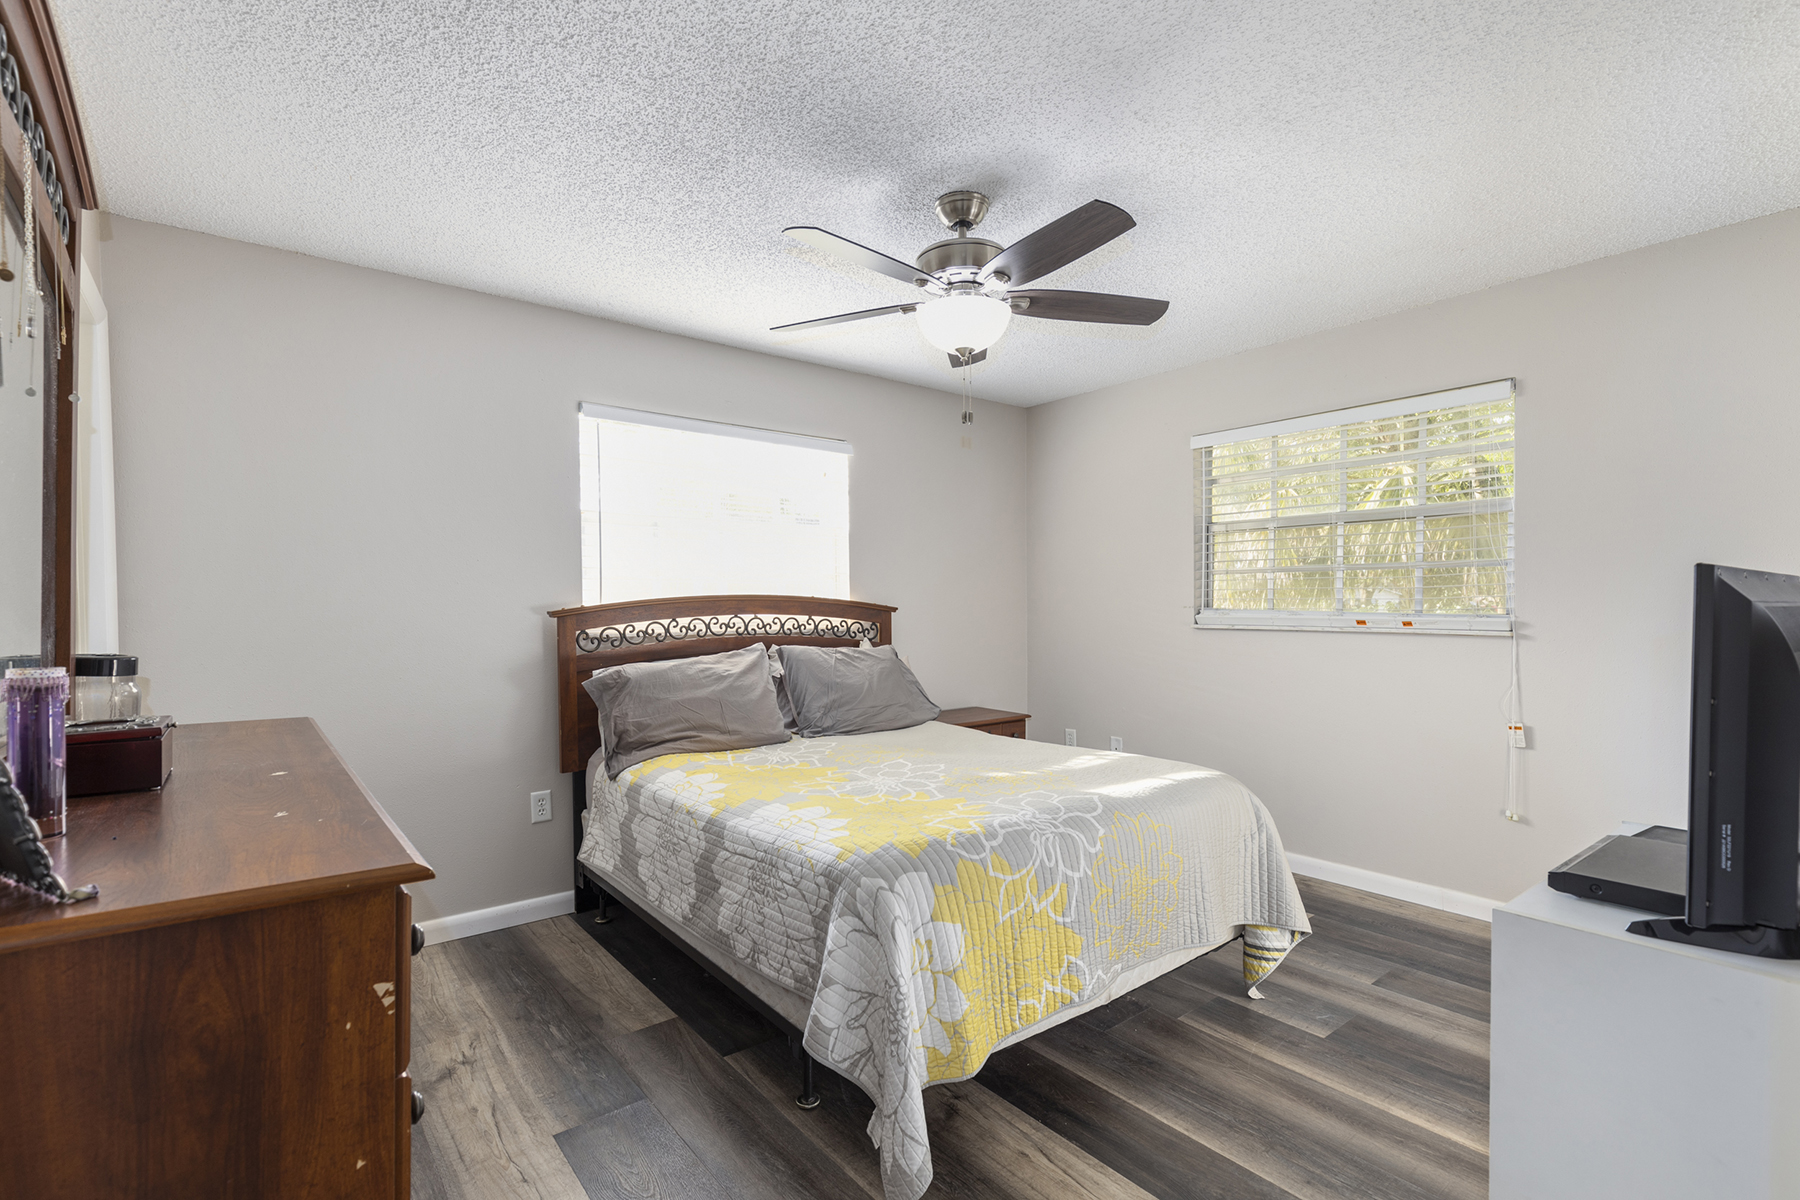 Additional photo for property listing at OCALA 11 Ne 50th Ct, Ocala, フロリダ 34470 アメリカ